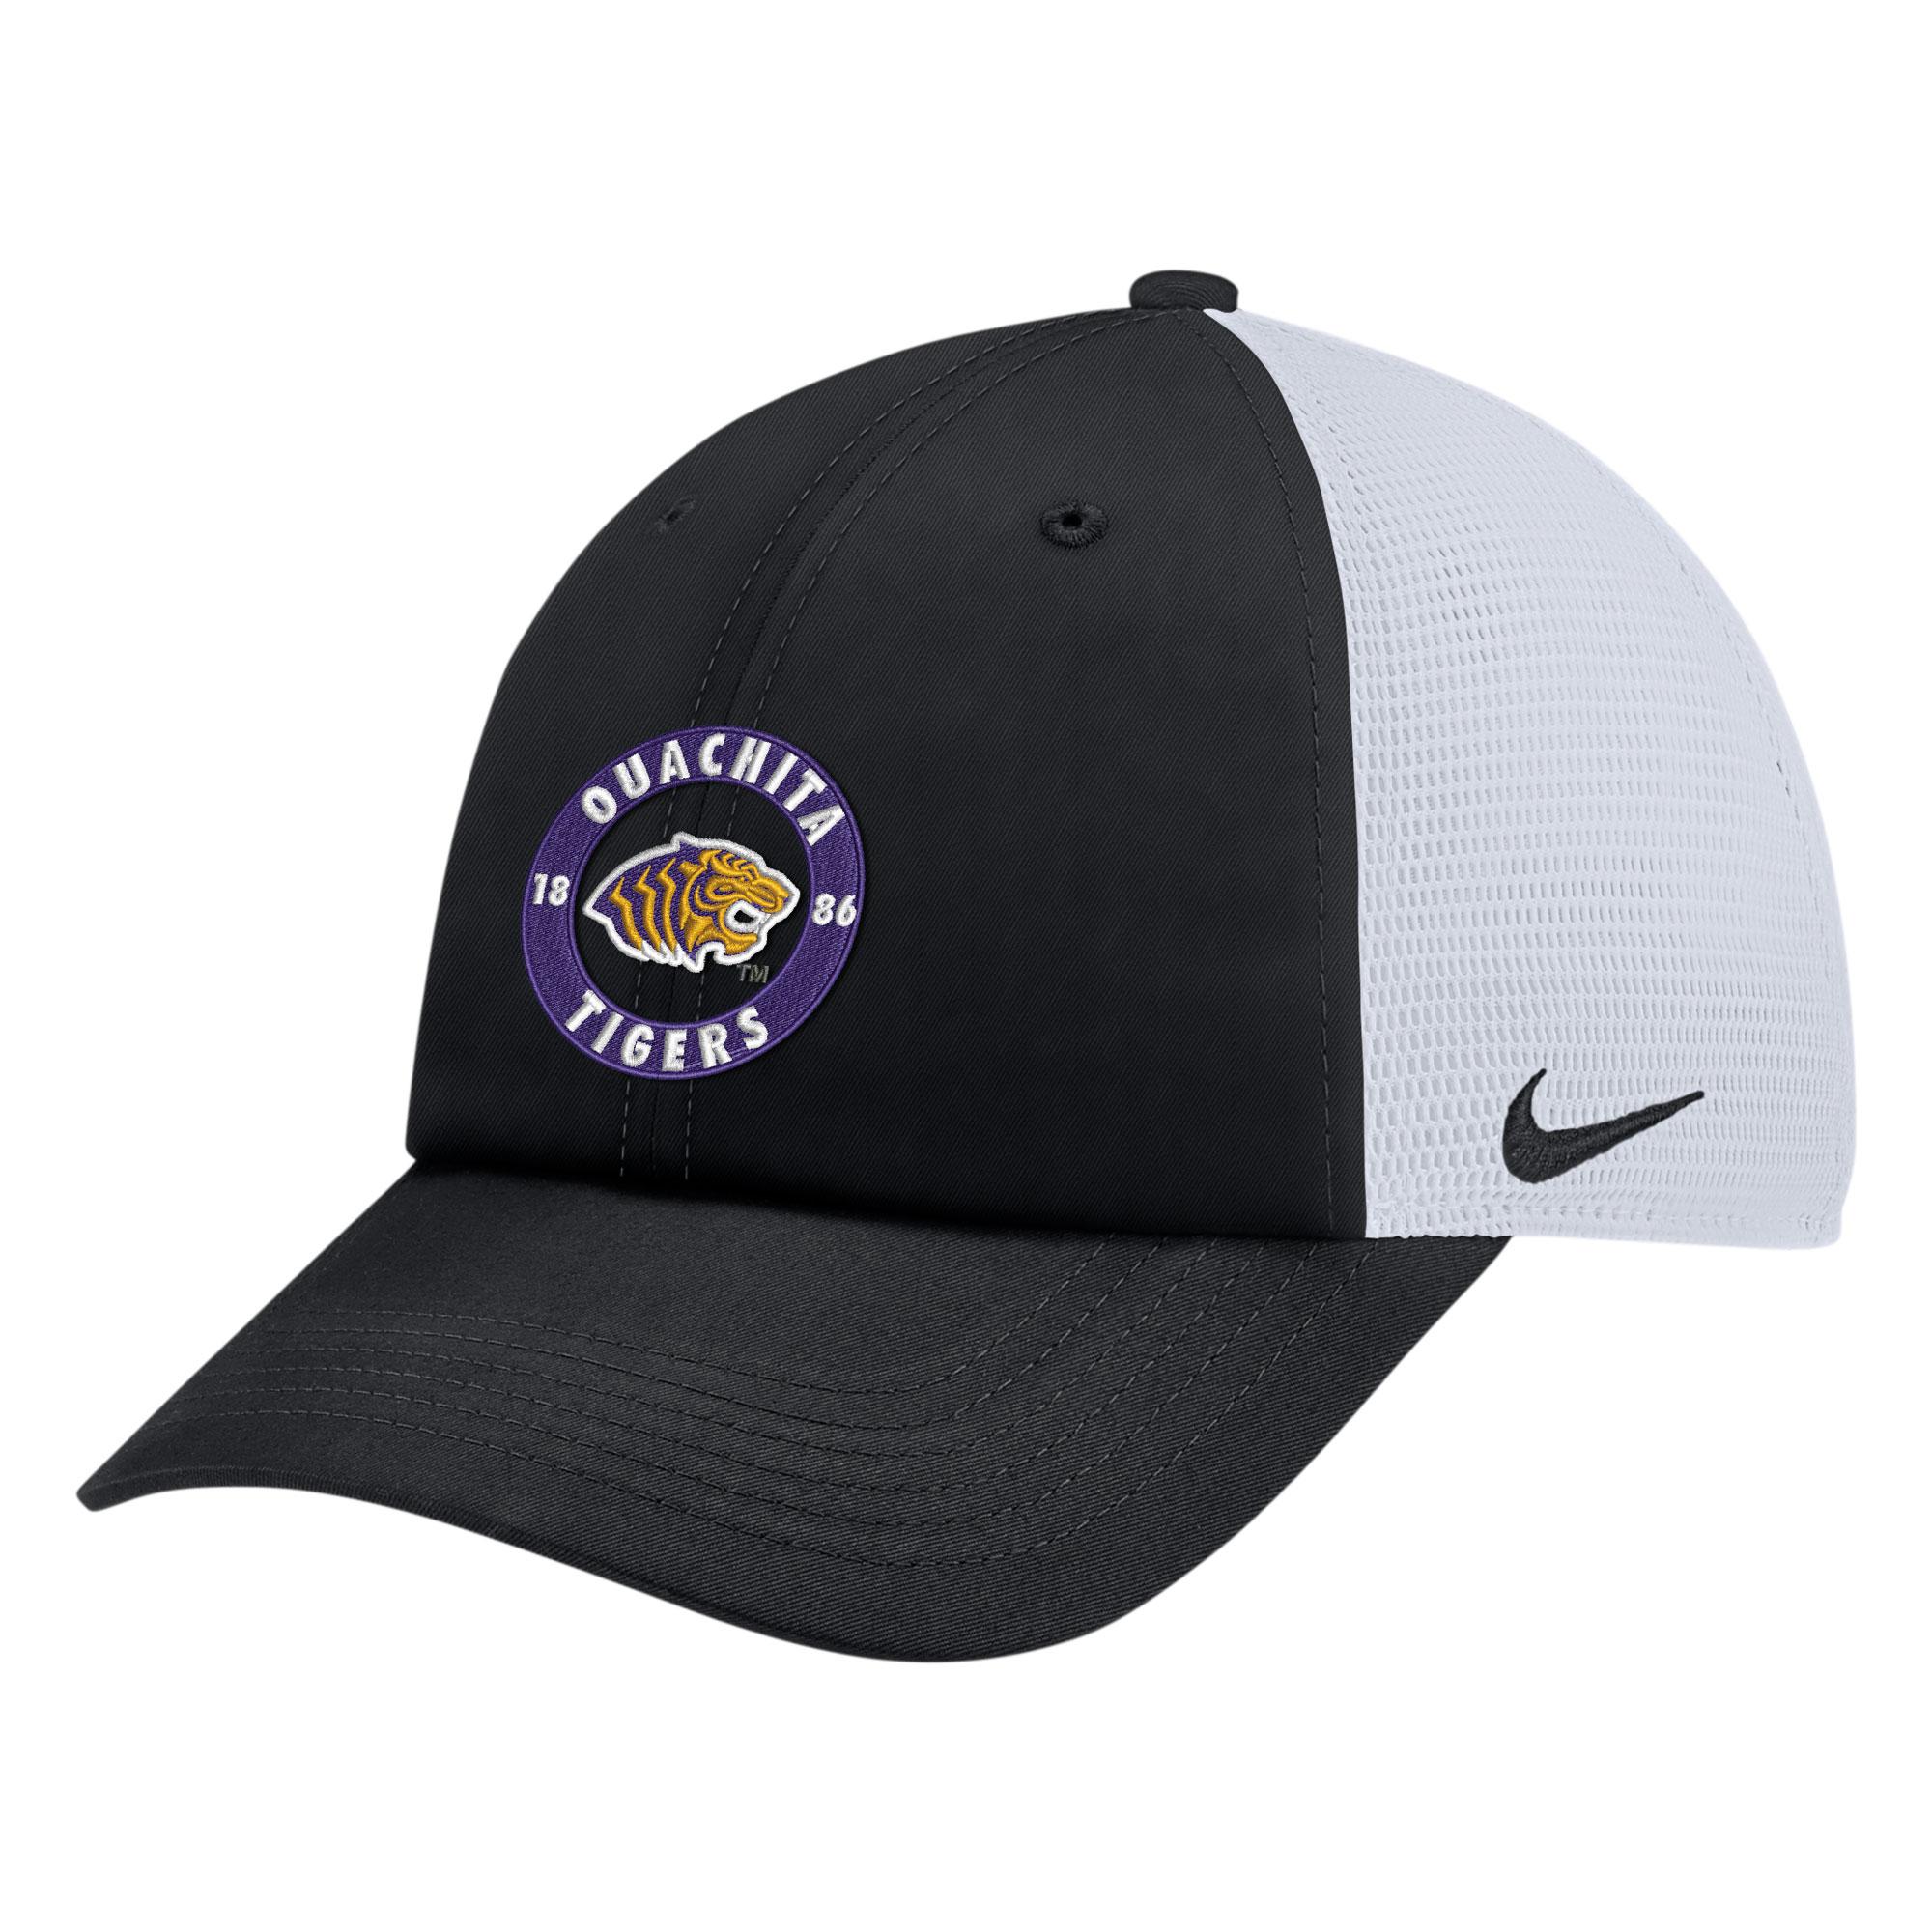 image of: OUACHITA TIGERS DRIFIT MESH CAP